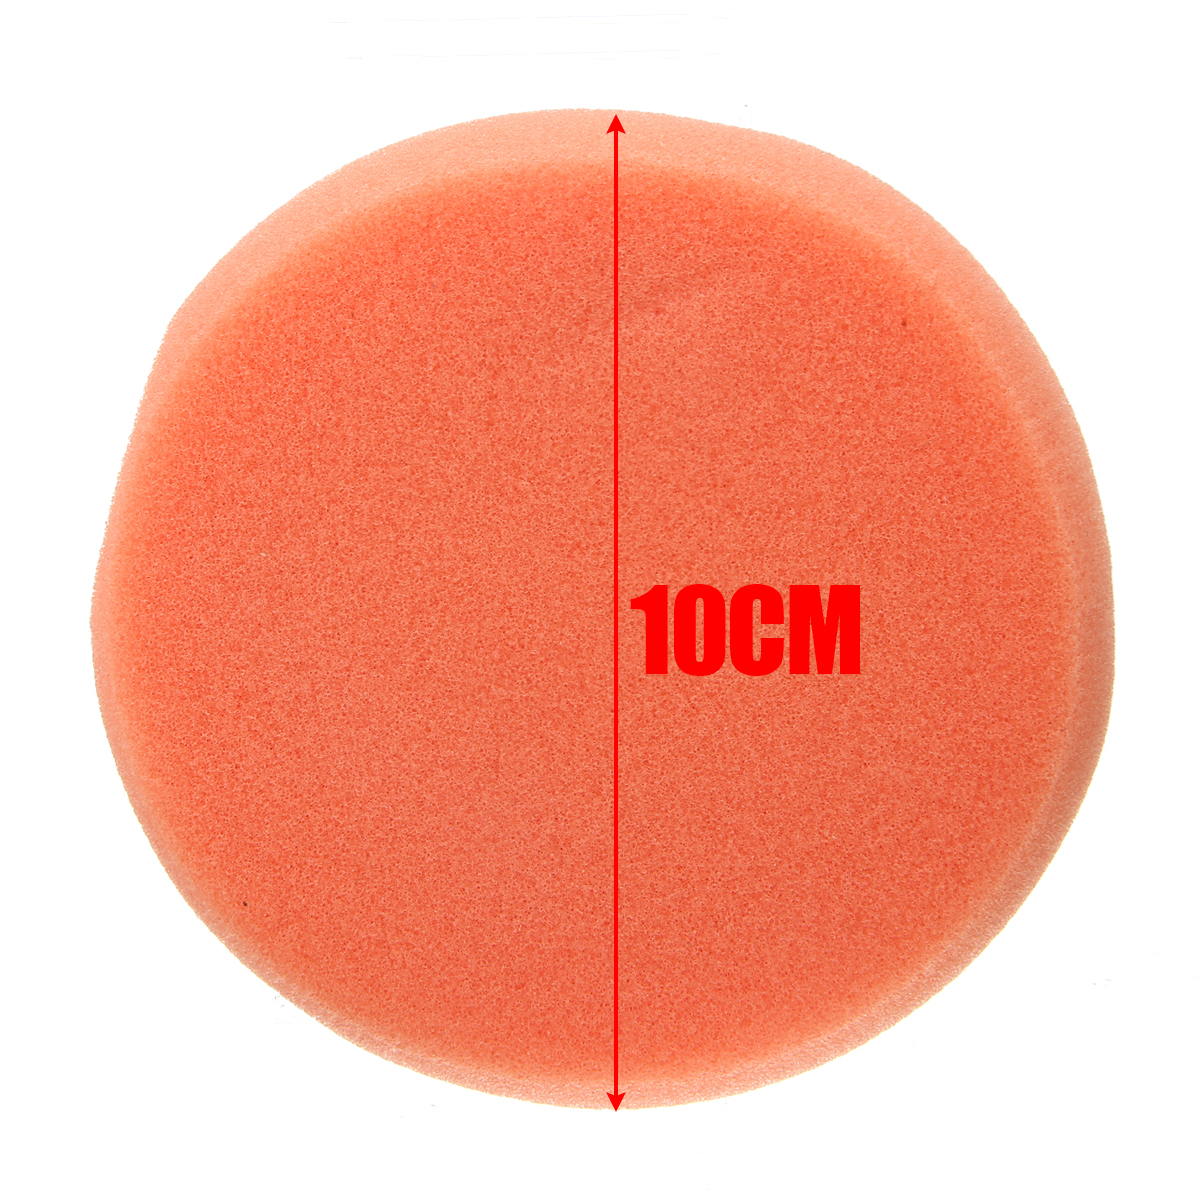 10CM Thicken Microfiber Applicator Sponge Foam Car Buffing Waxing Polishing Cleaning Sponge Pads With Handle